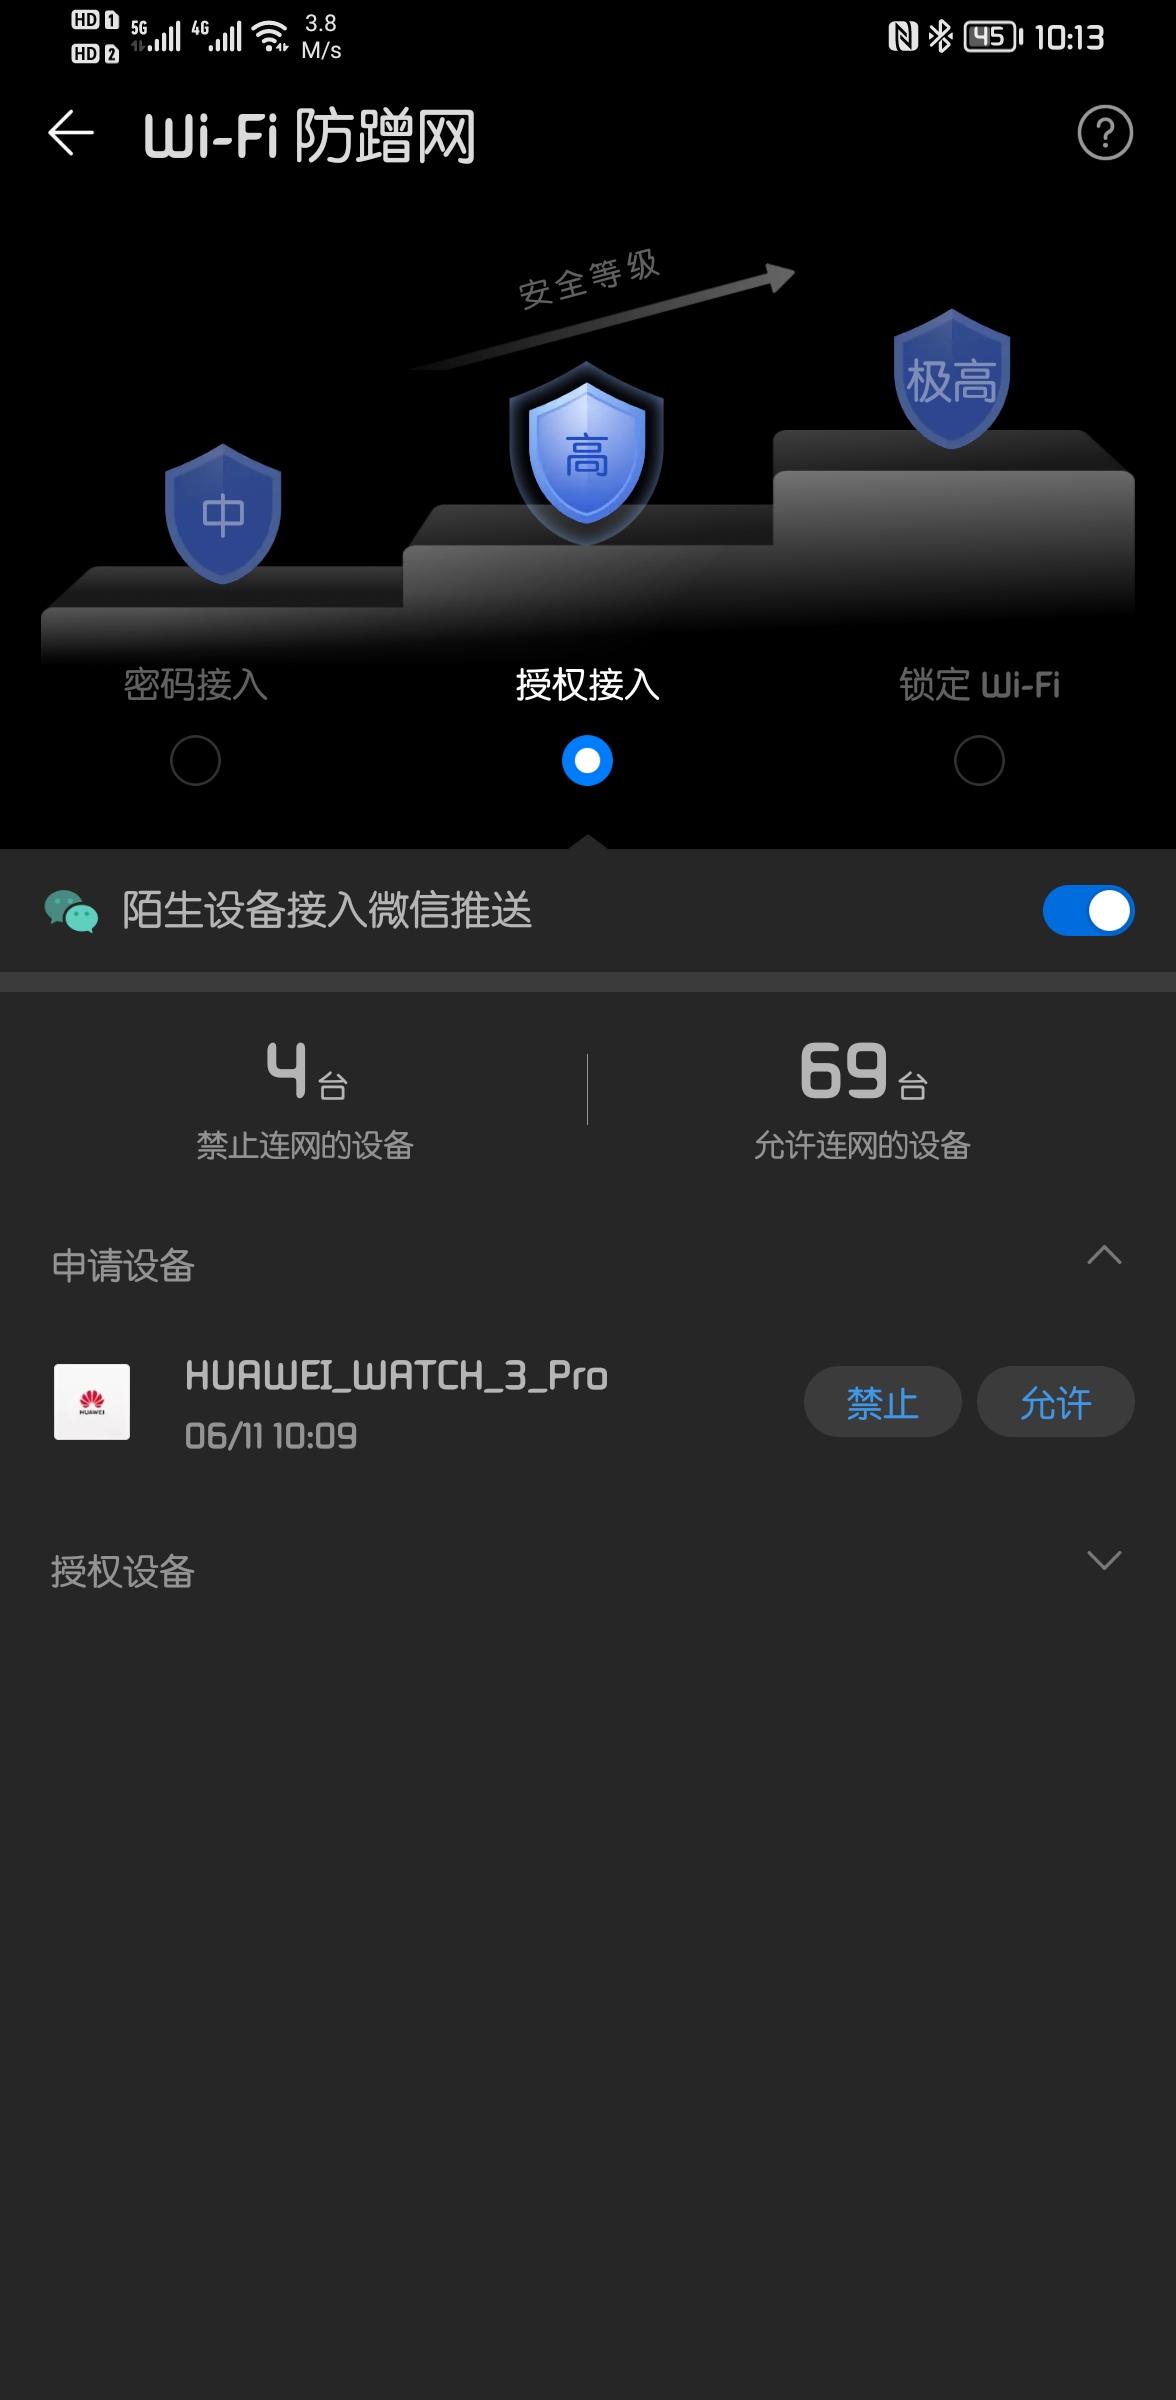 Screenshot_20210611_101306_com.huawei.smarthome.jpg